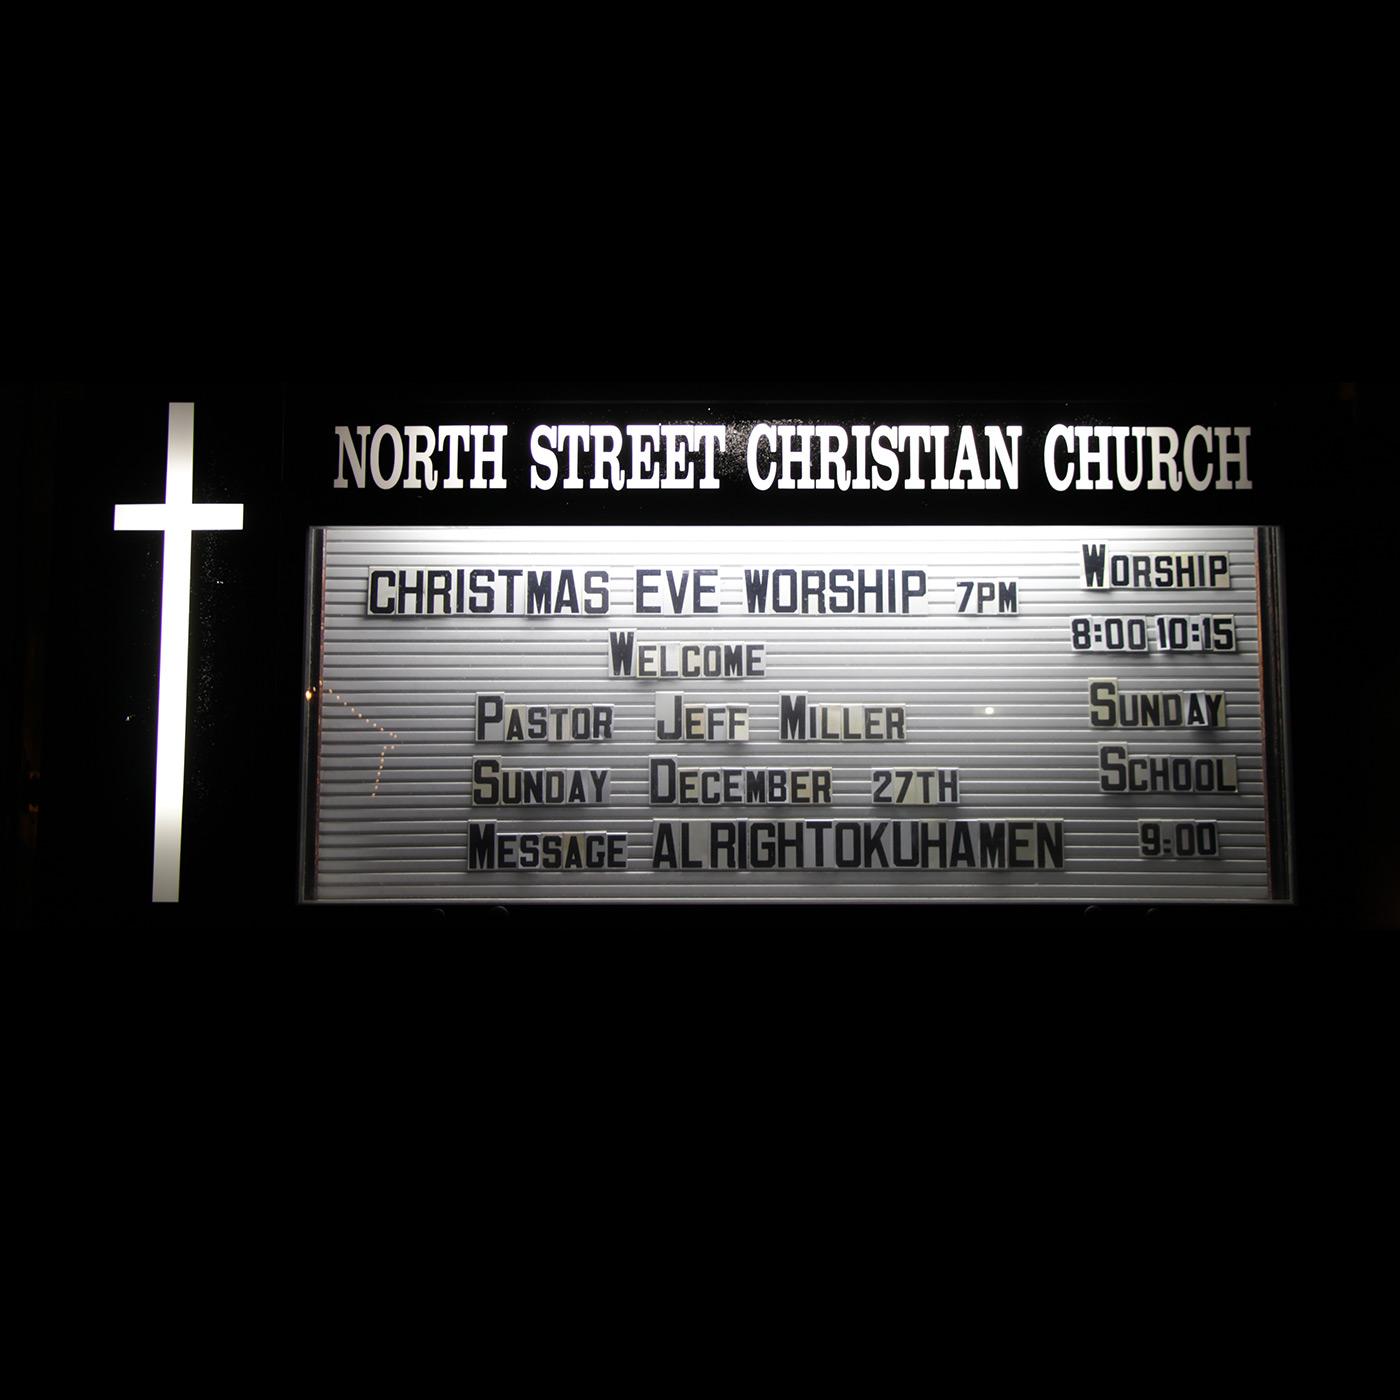 North Street Christian Church - Christmas Eve Service